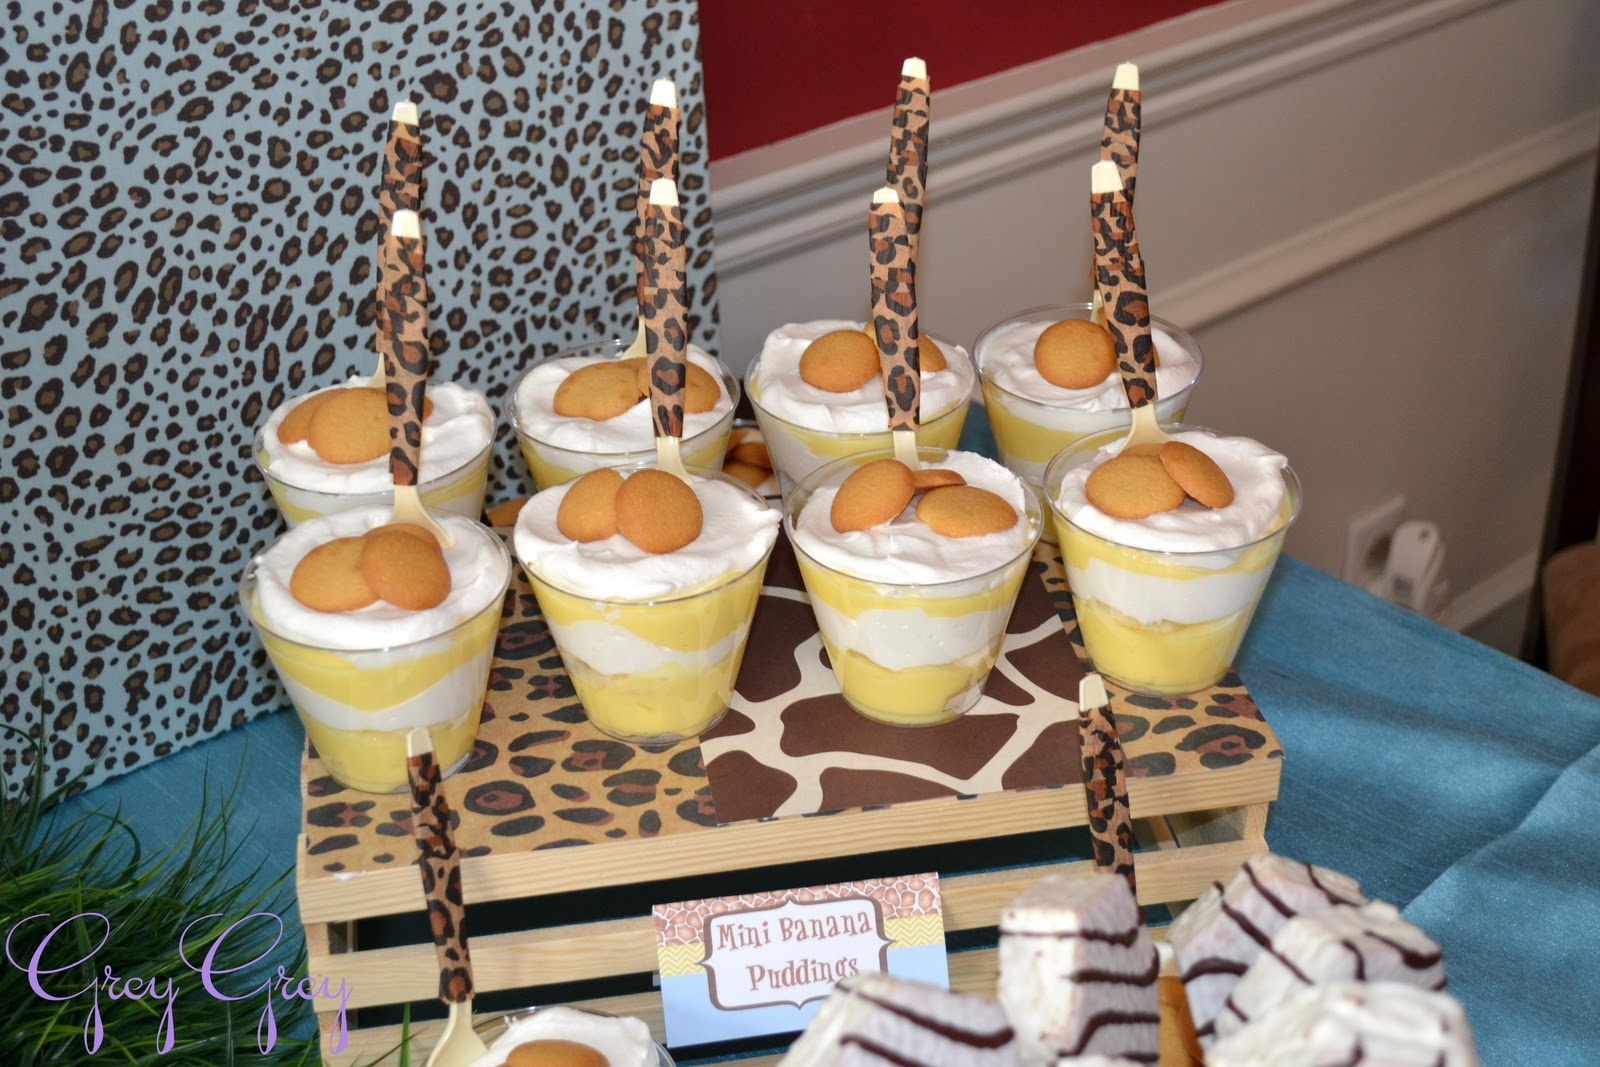 Cheetah Spoons